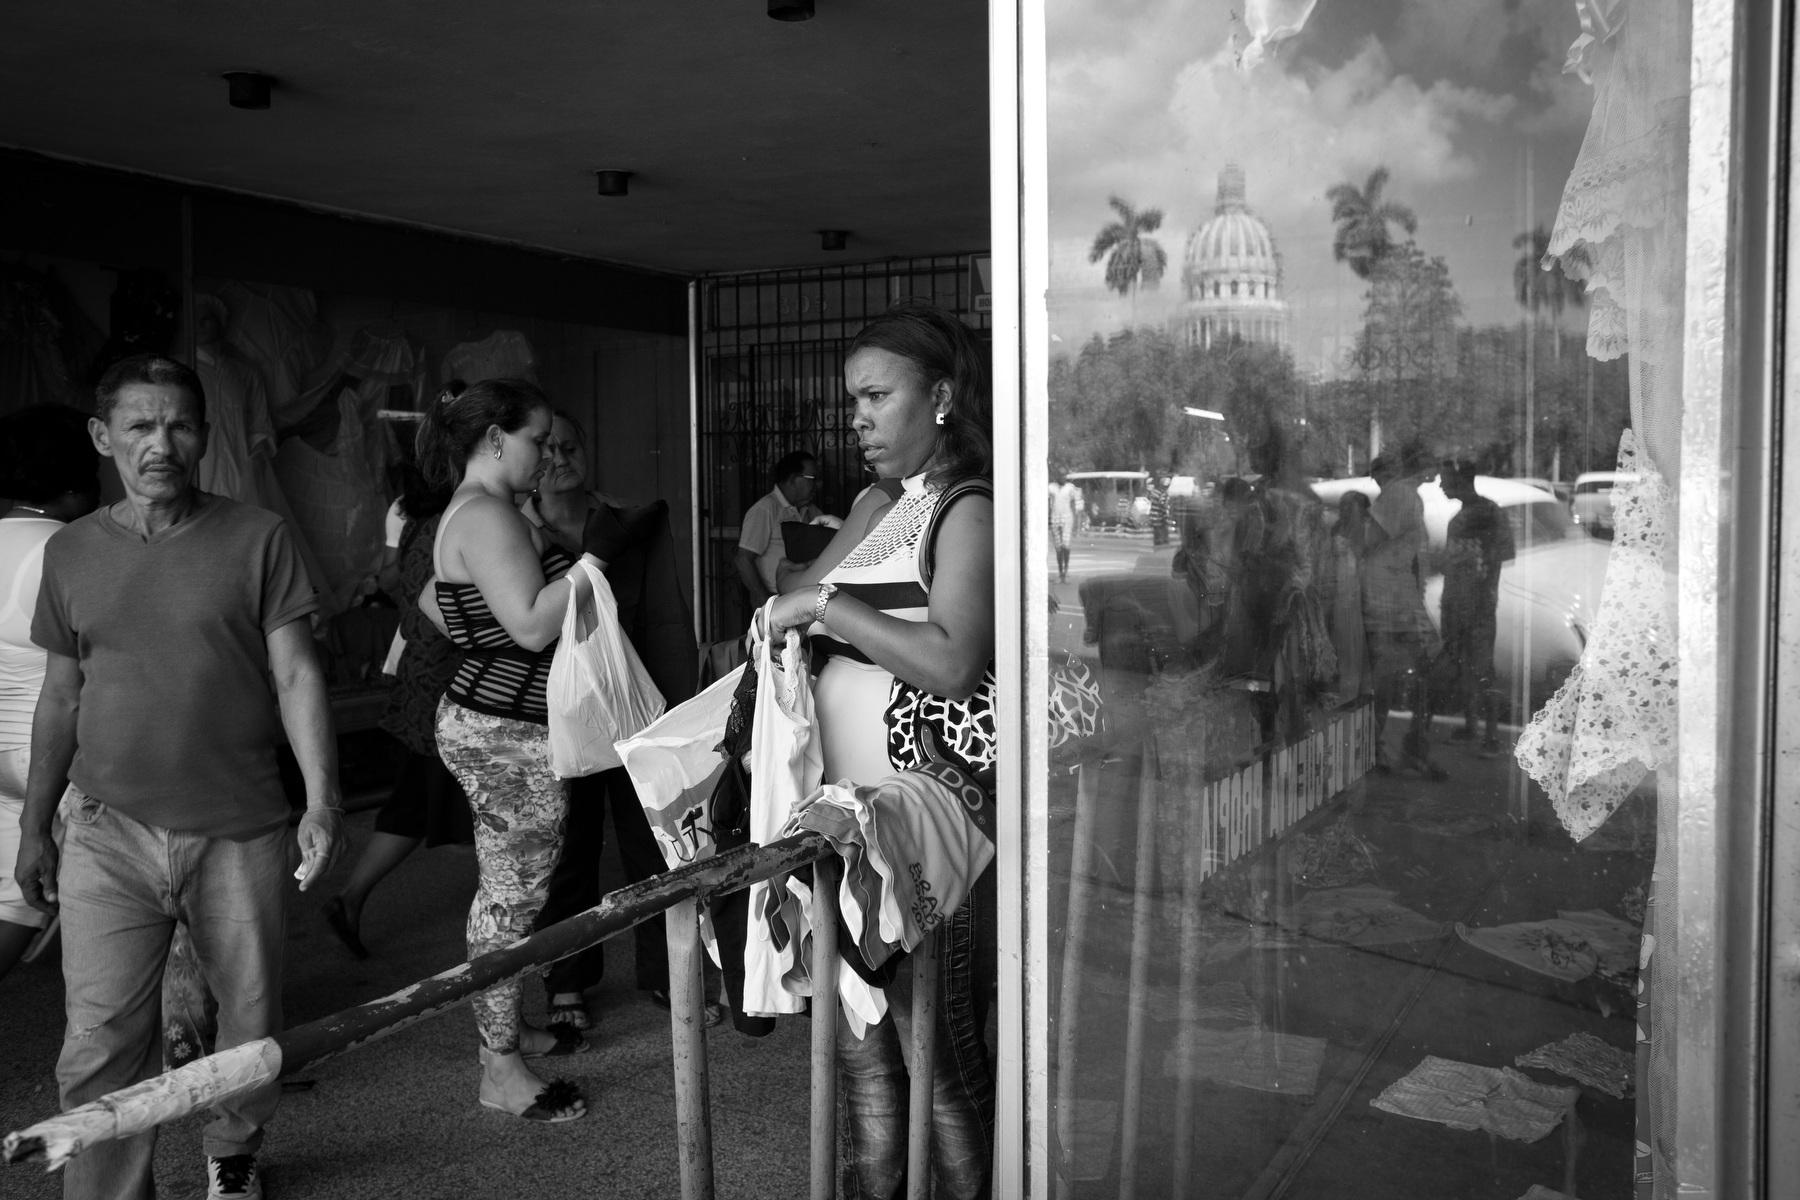 Cuba_2014_Poole009.JPG